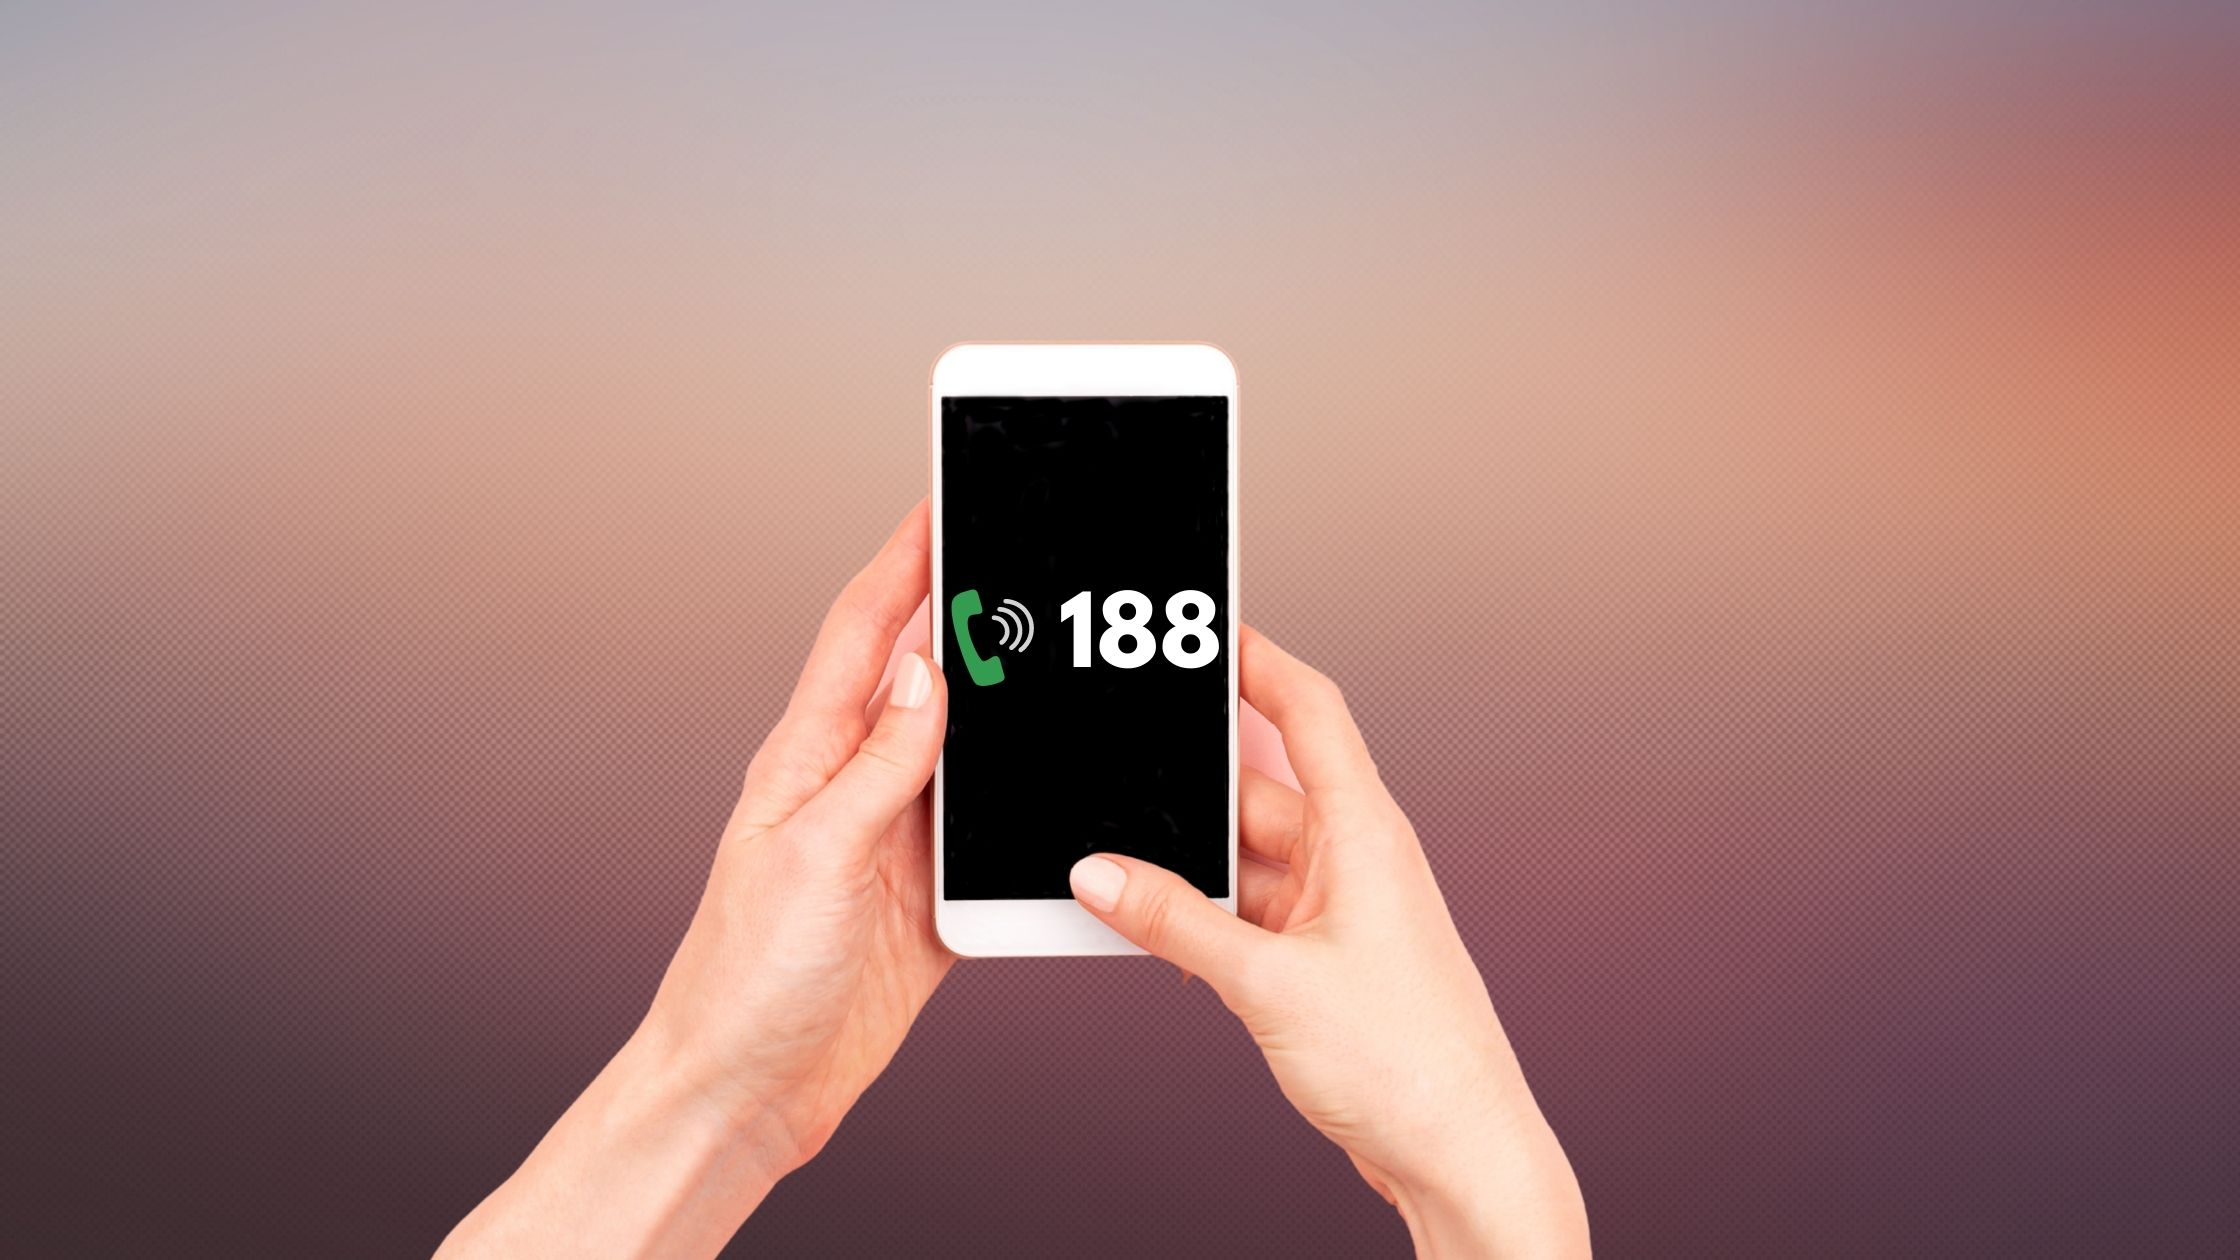 nomor 188